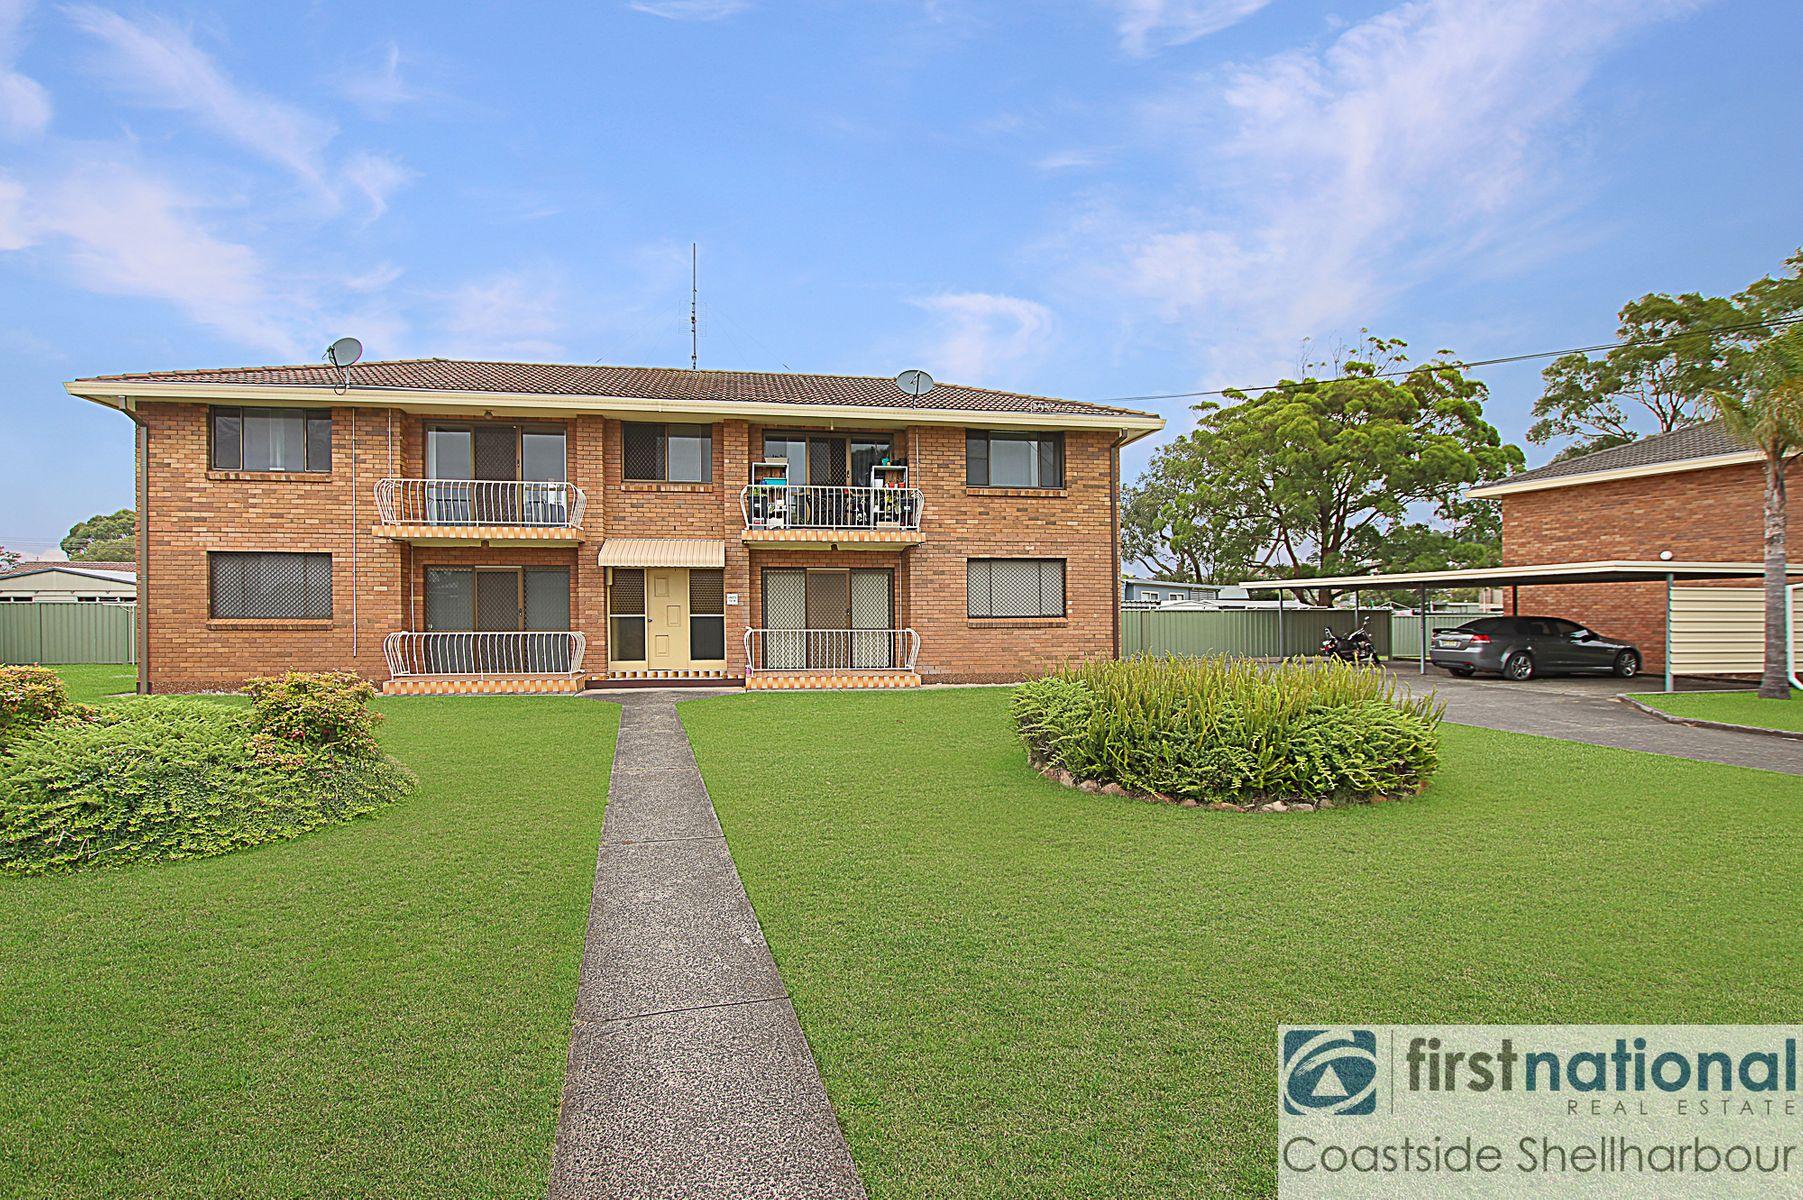 13/1-5 Whitfield Place, Lake Illawarra, NSW 2528